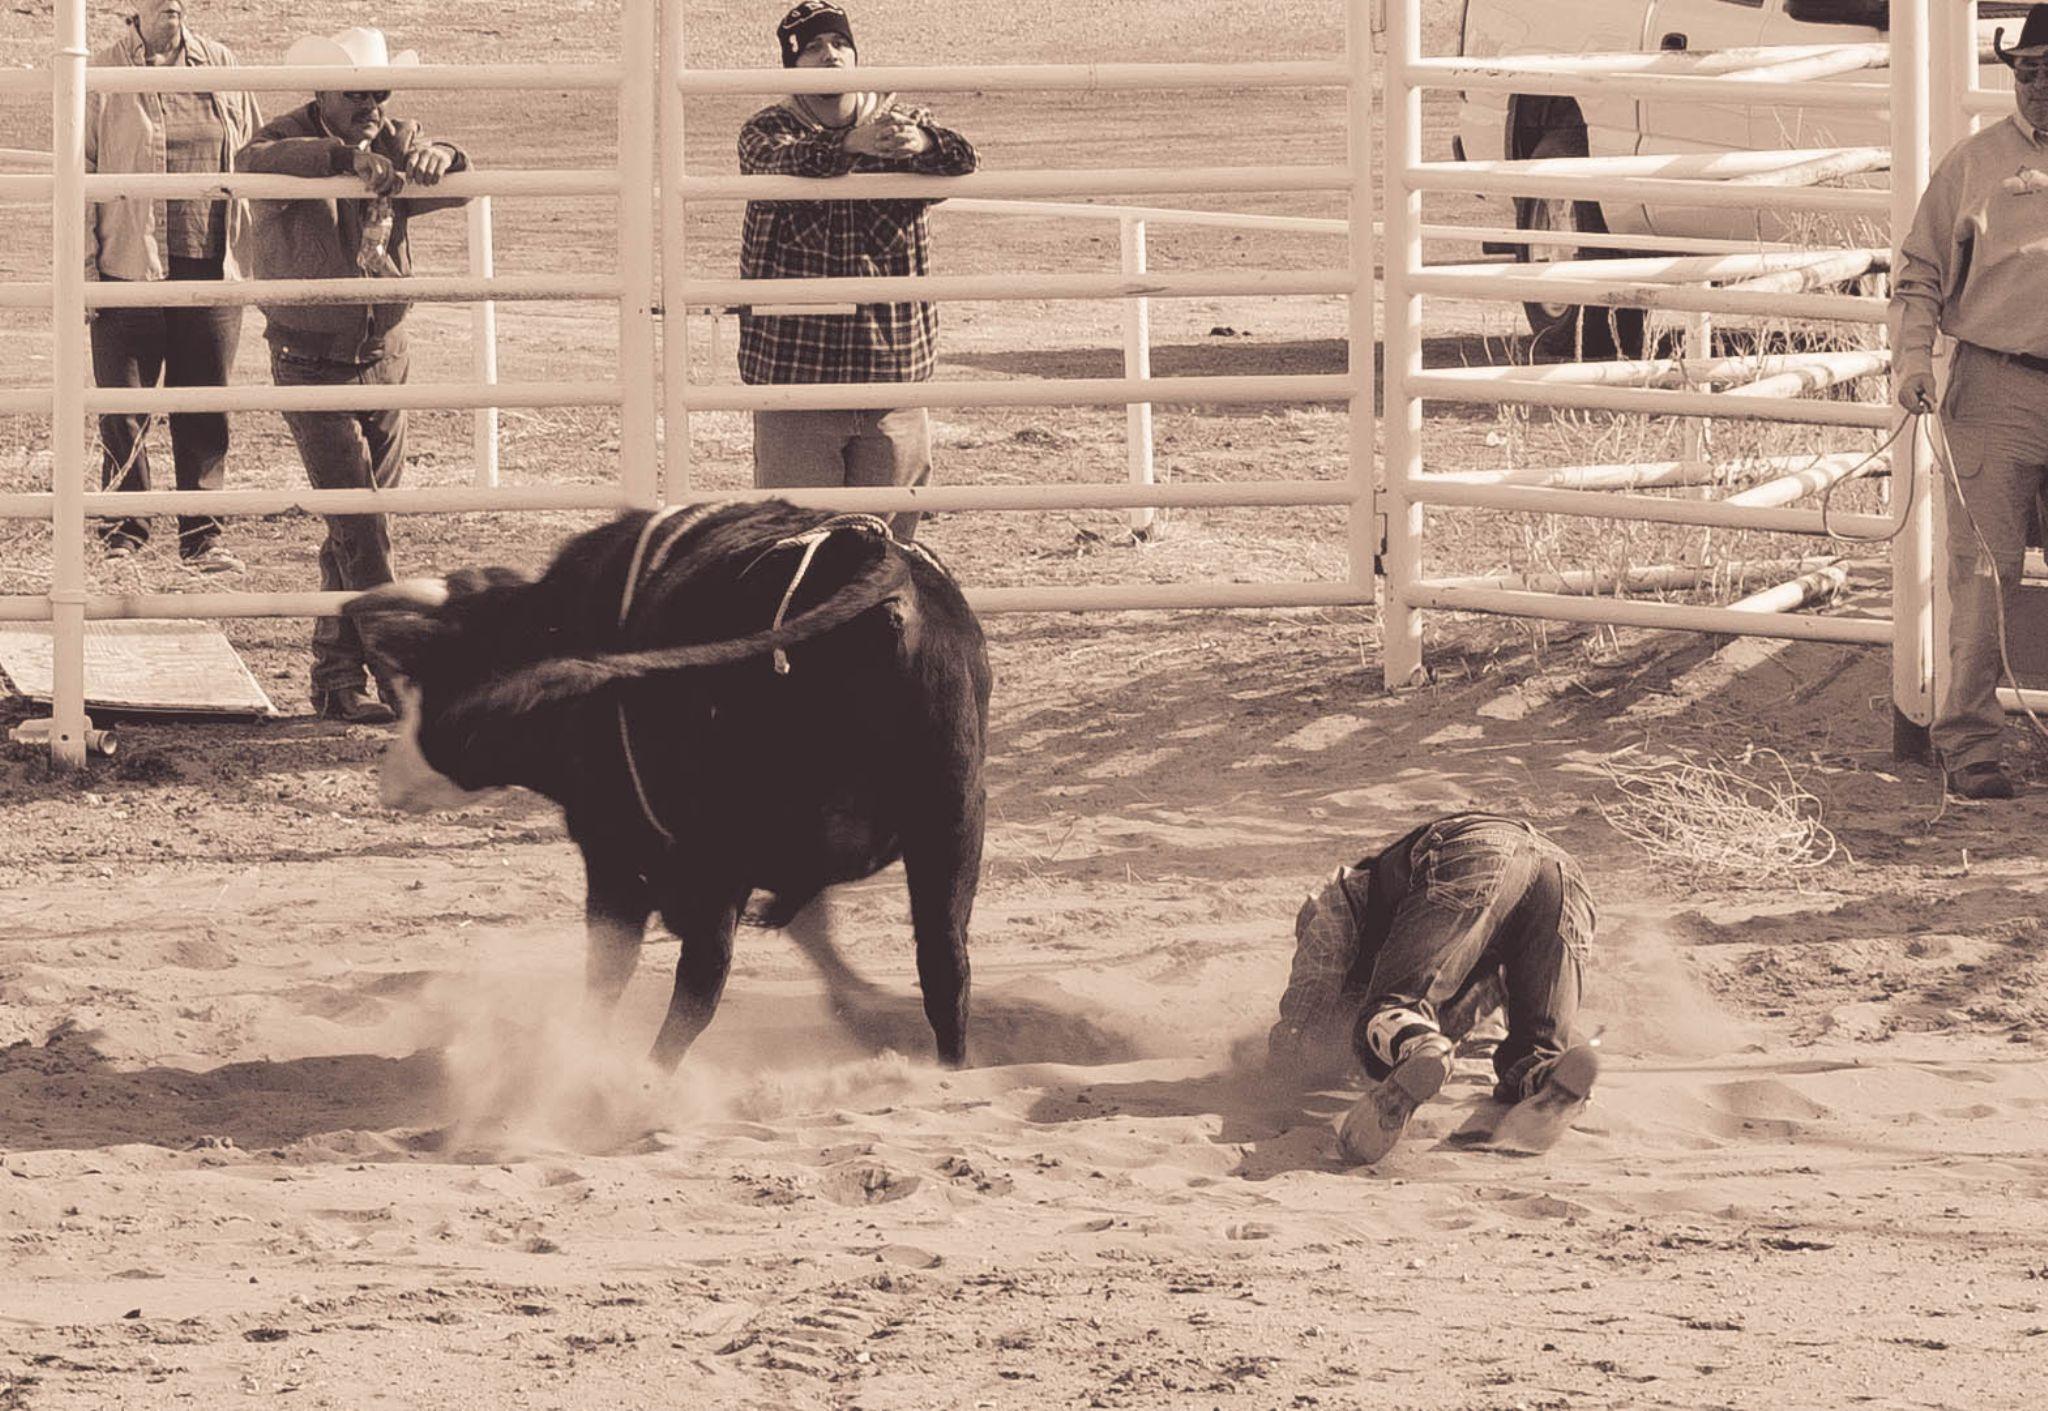 texas bullriding by Connie Anderson